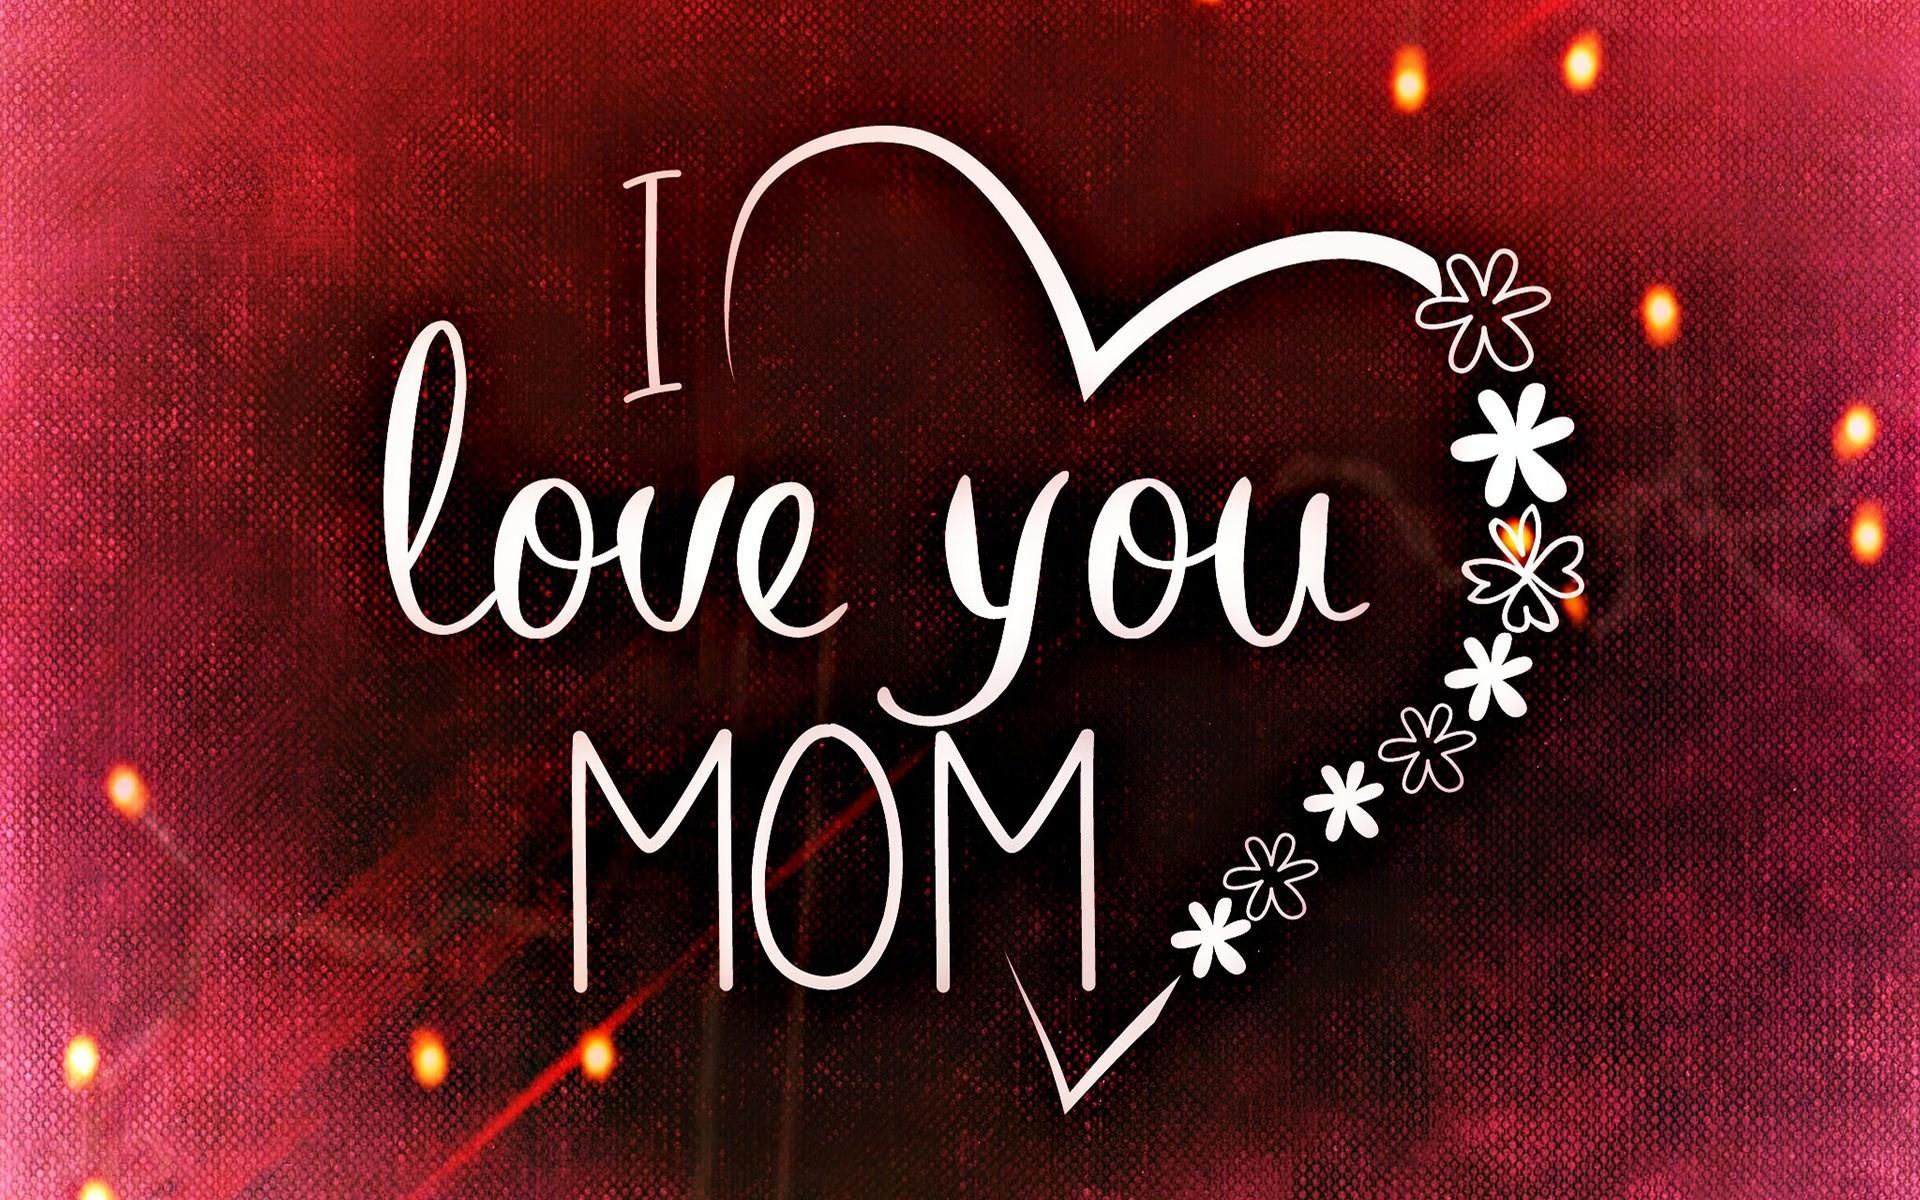 i love you mom wallpaper hd